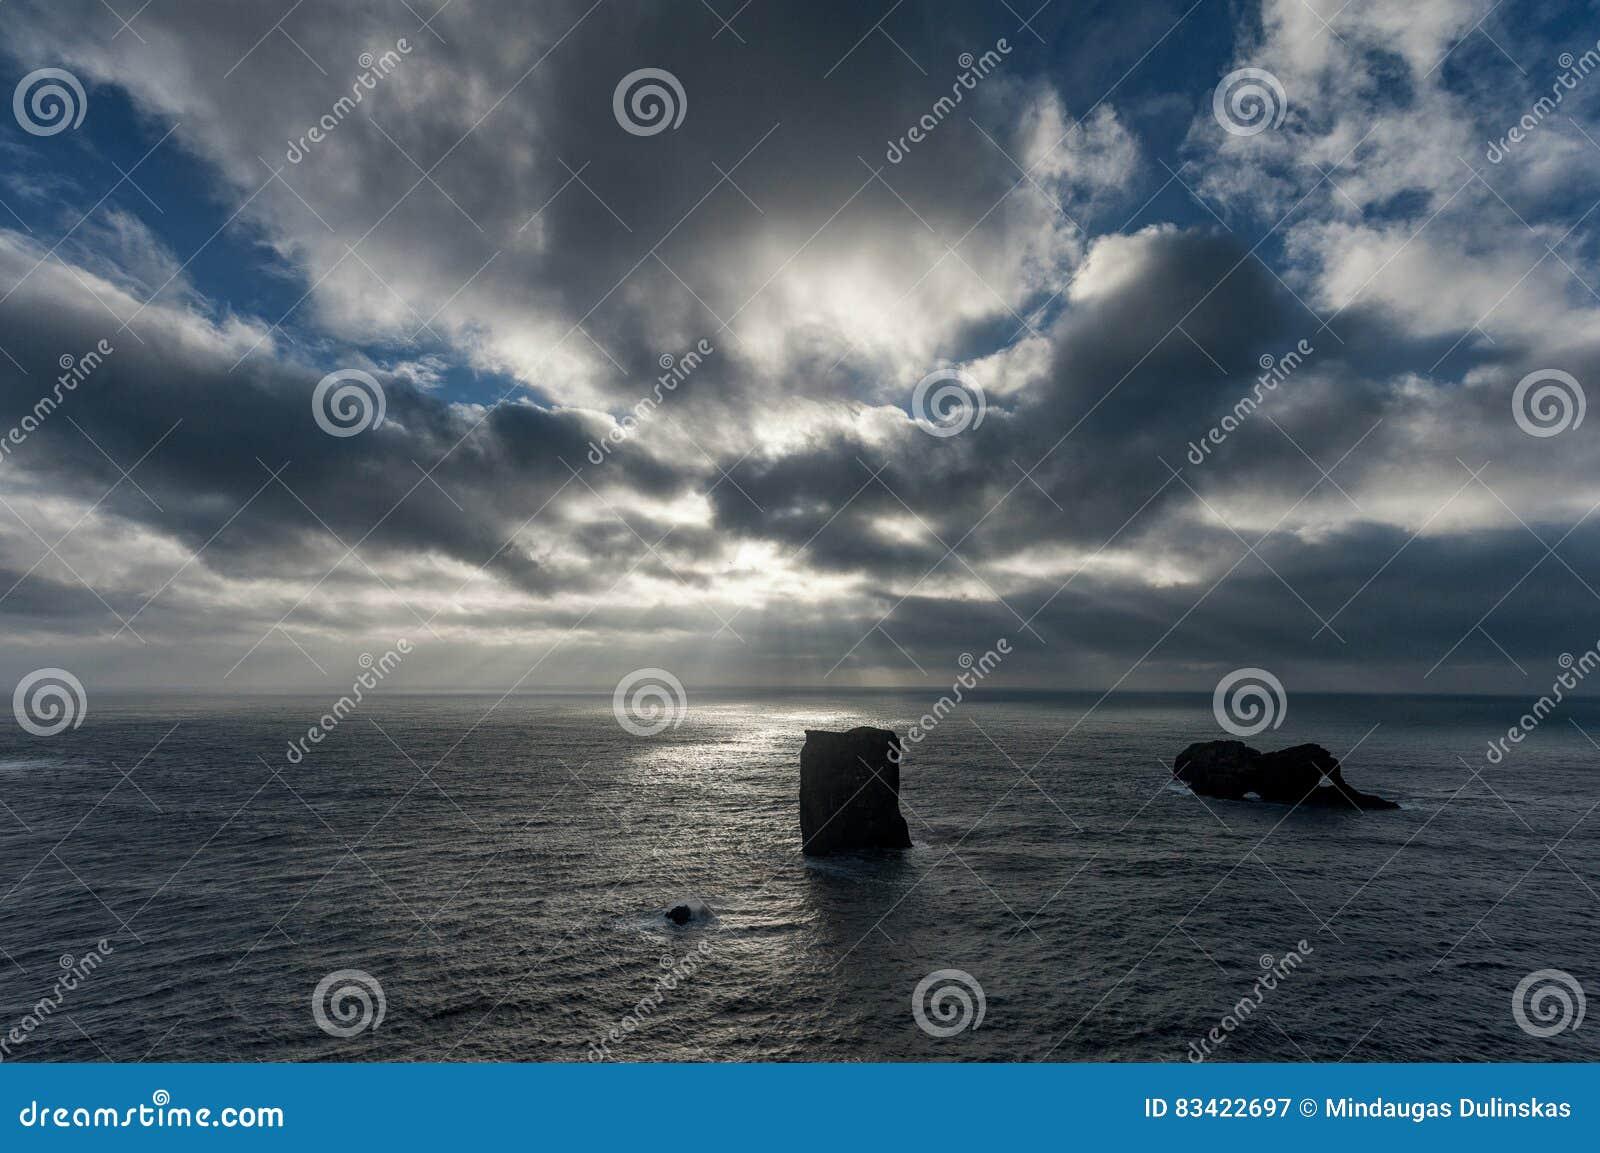 Dyrholaey Area in Iceland. Close to Black Sand Beach. Sunrise. Sunlight. Cloudy Sky